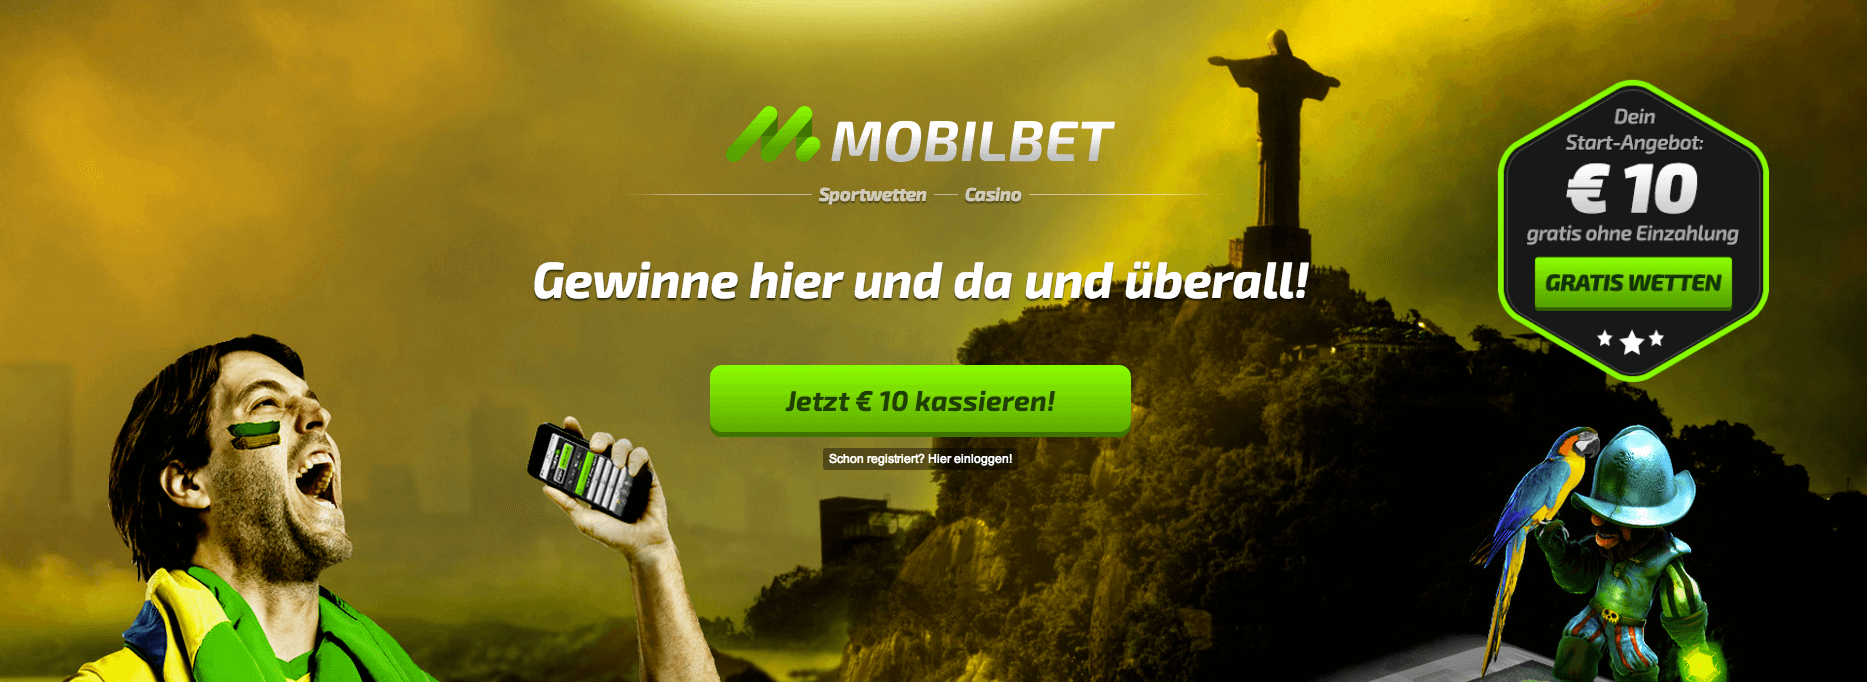 mobilbet bonuscode